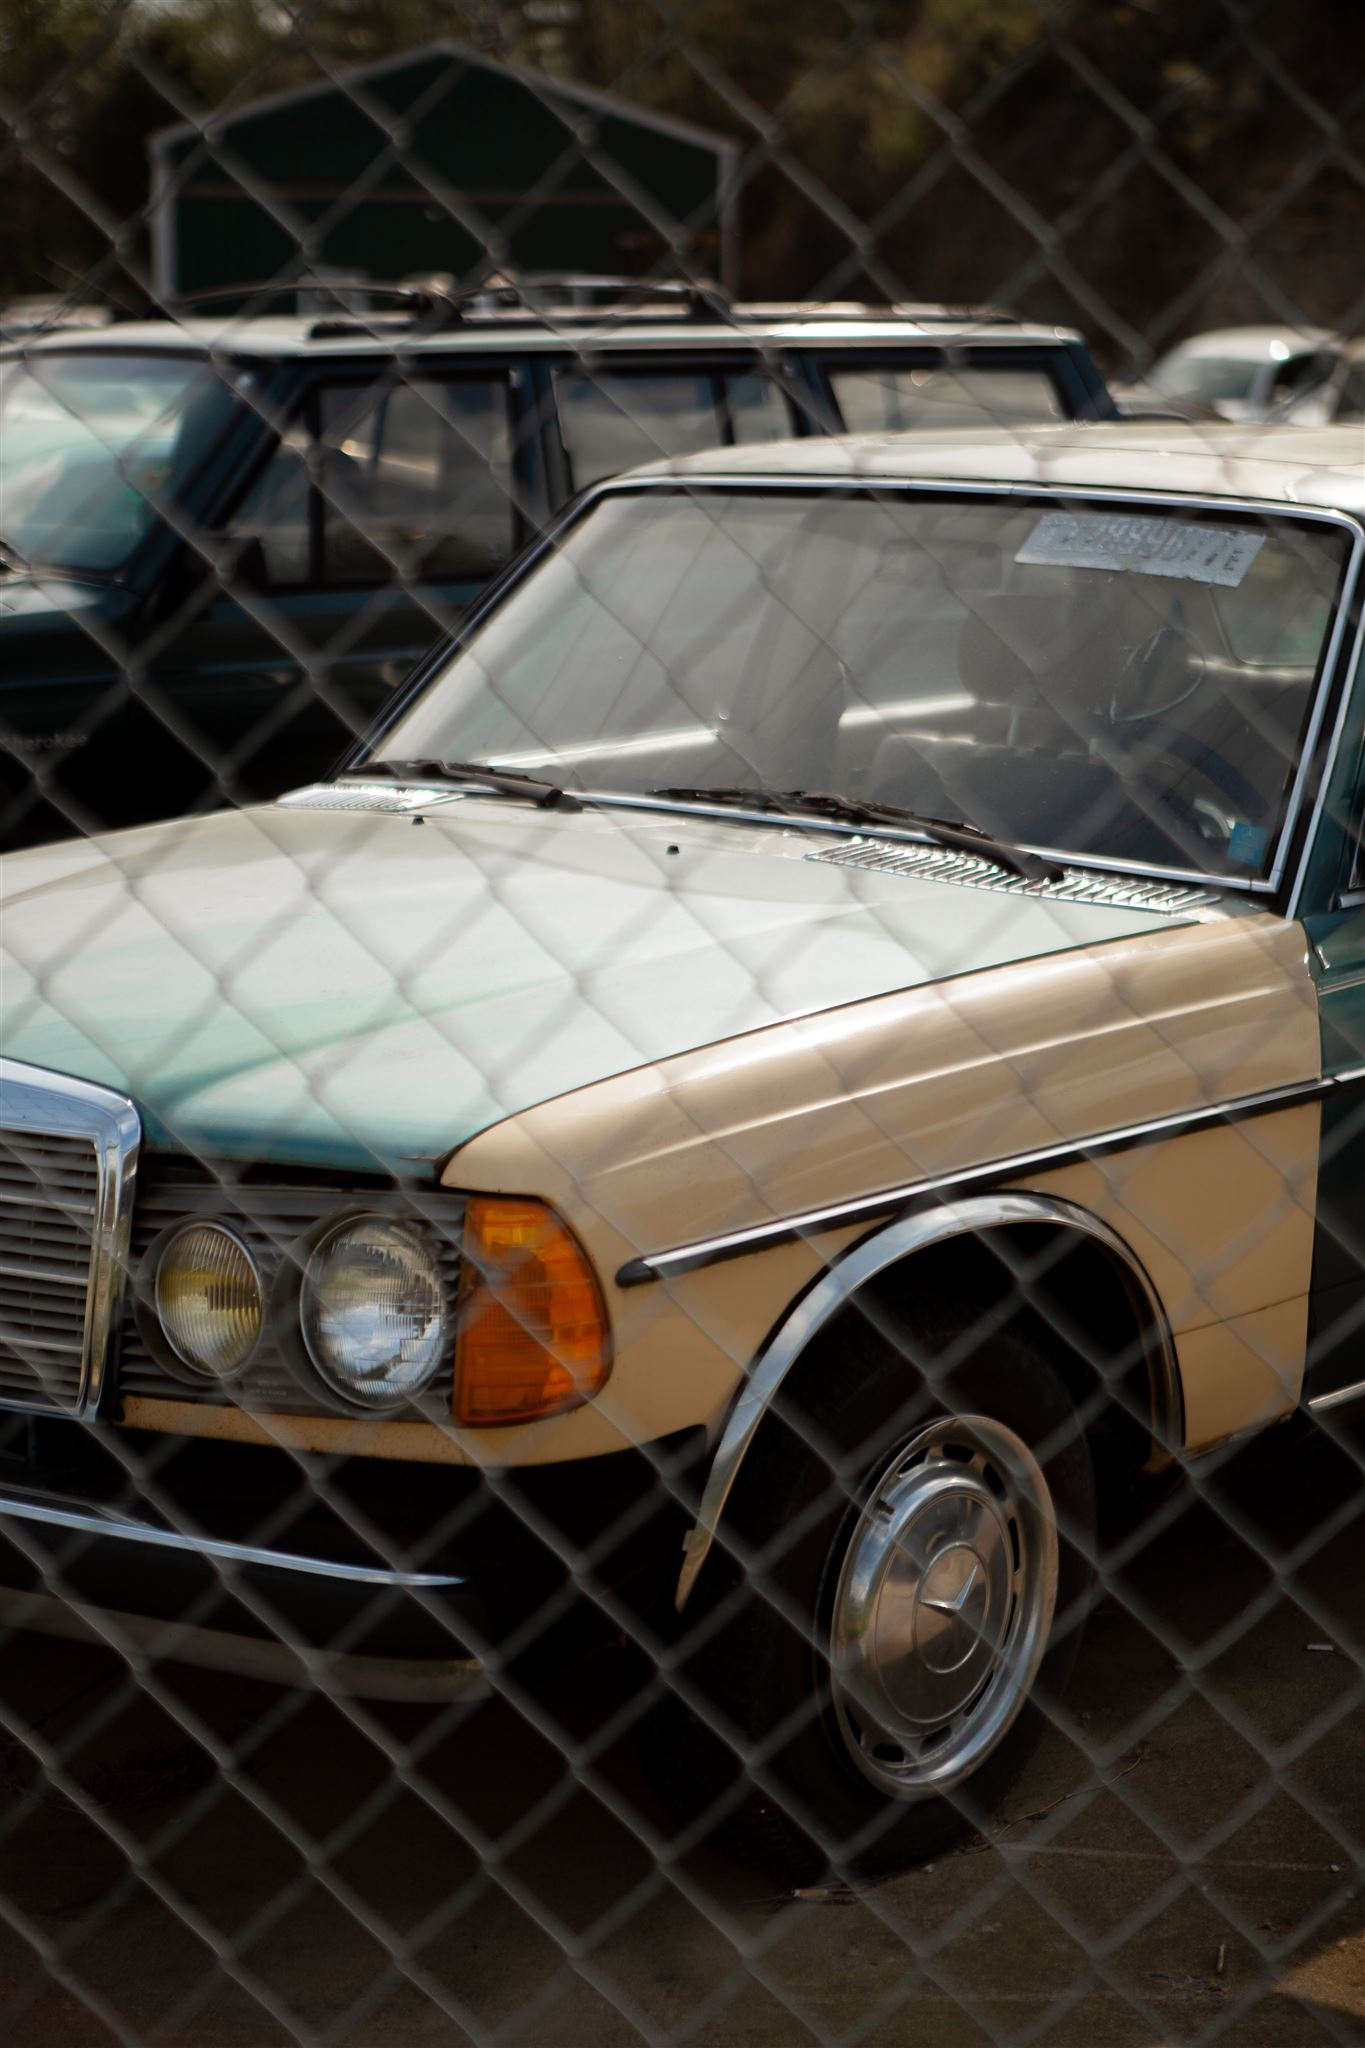 En gammel gul Mercedes bag et trådhegn